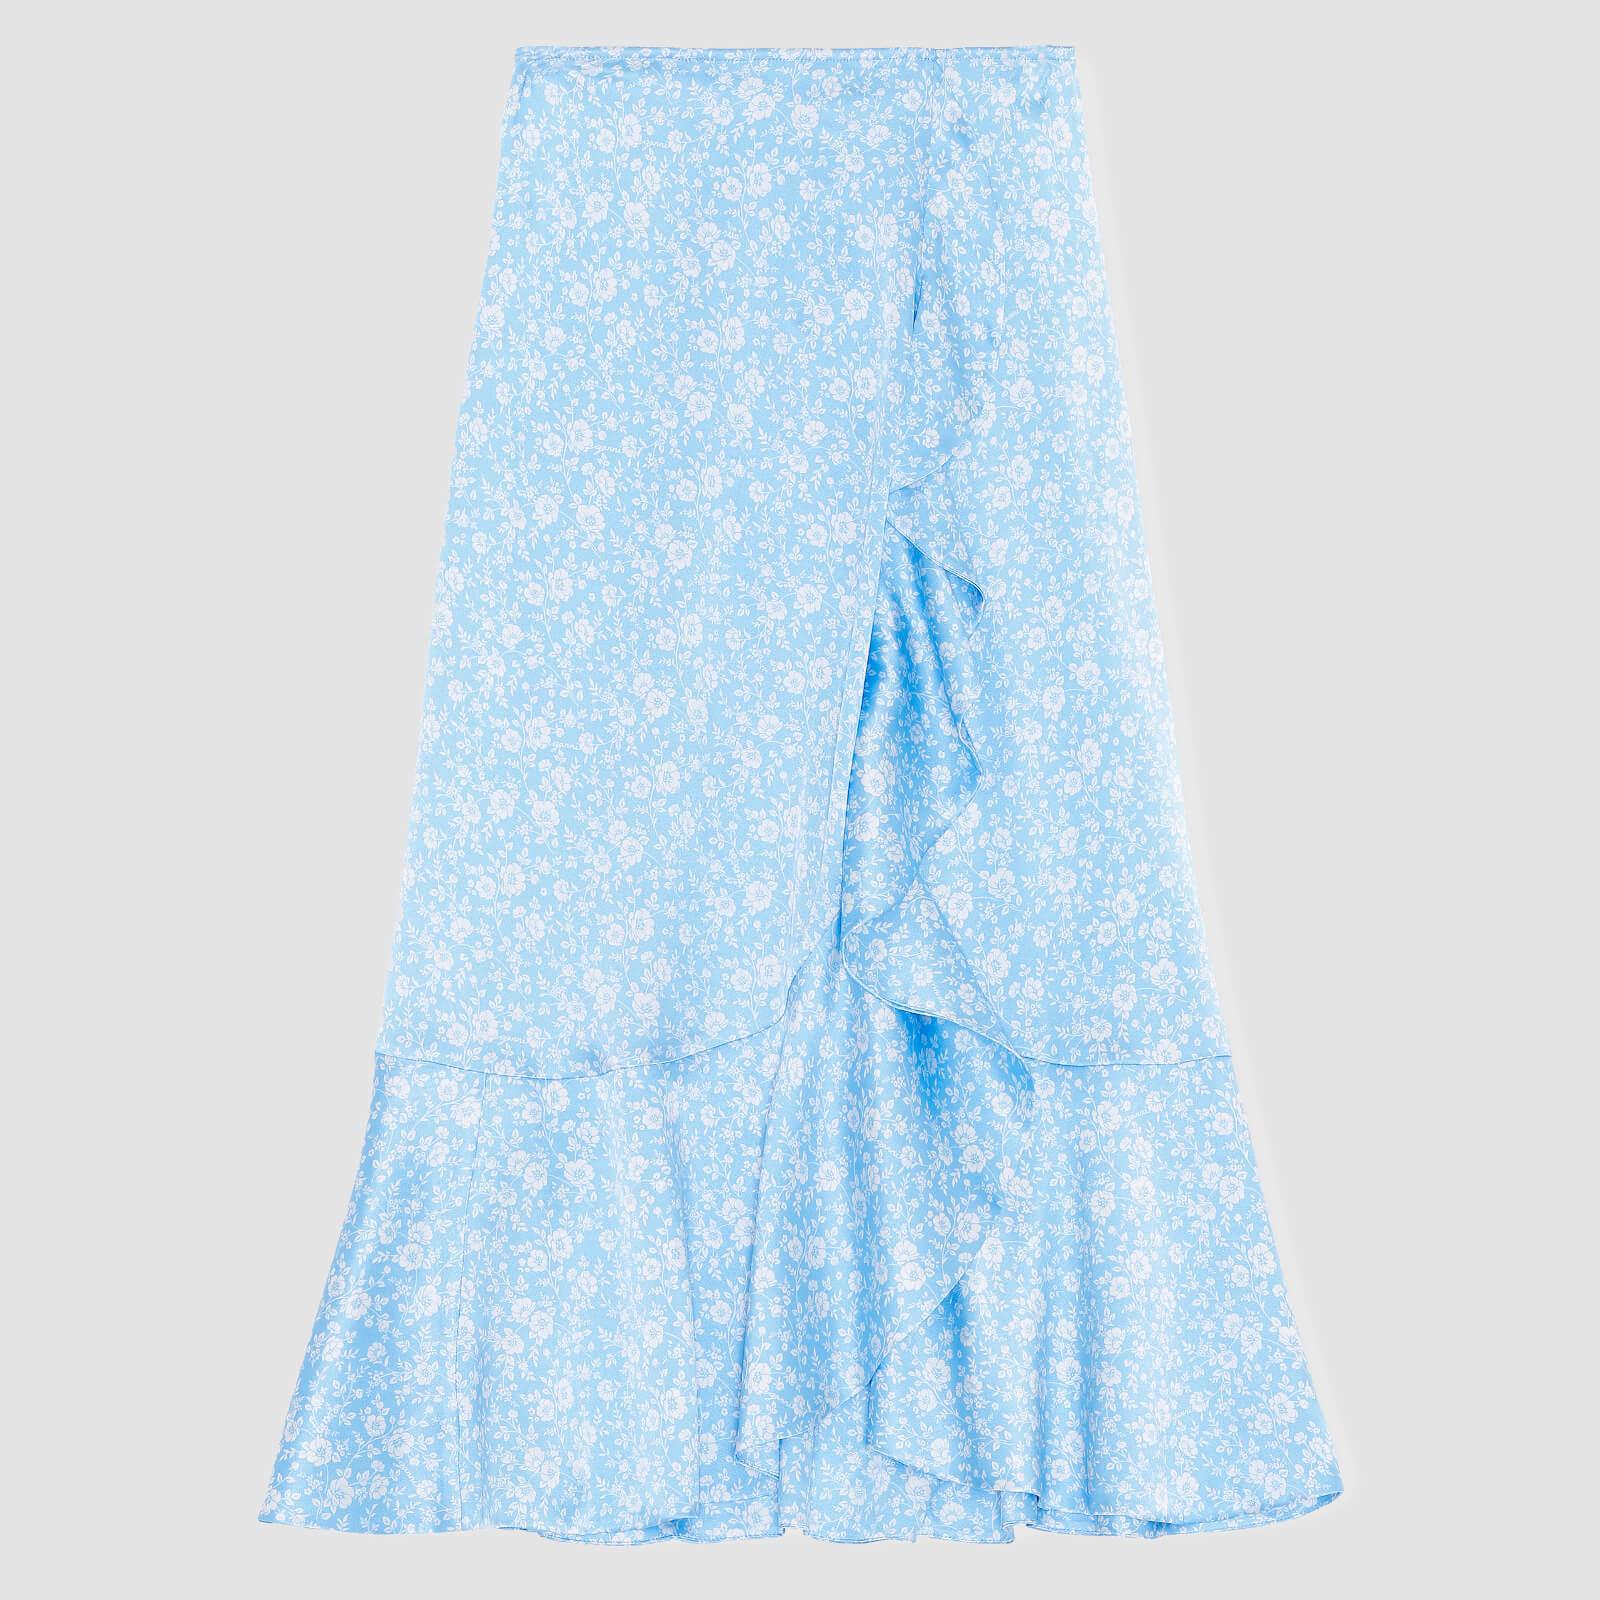 Ganni Women's Silk Stretch Satin Skirt - Alaskan Blue - Eu 34/Uk 6